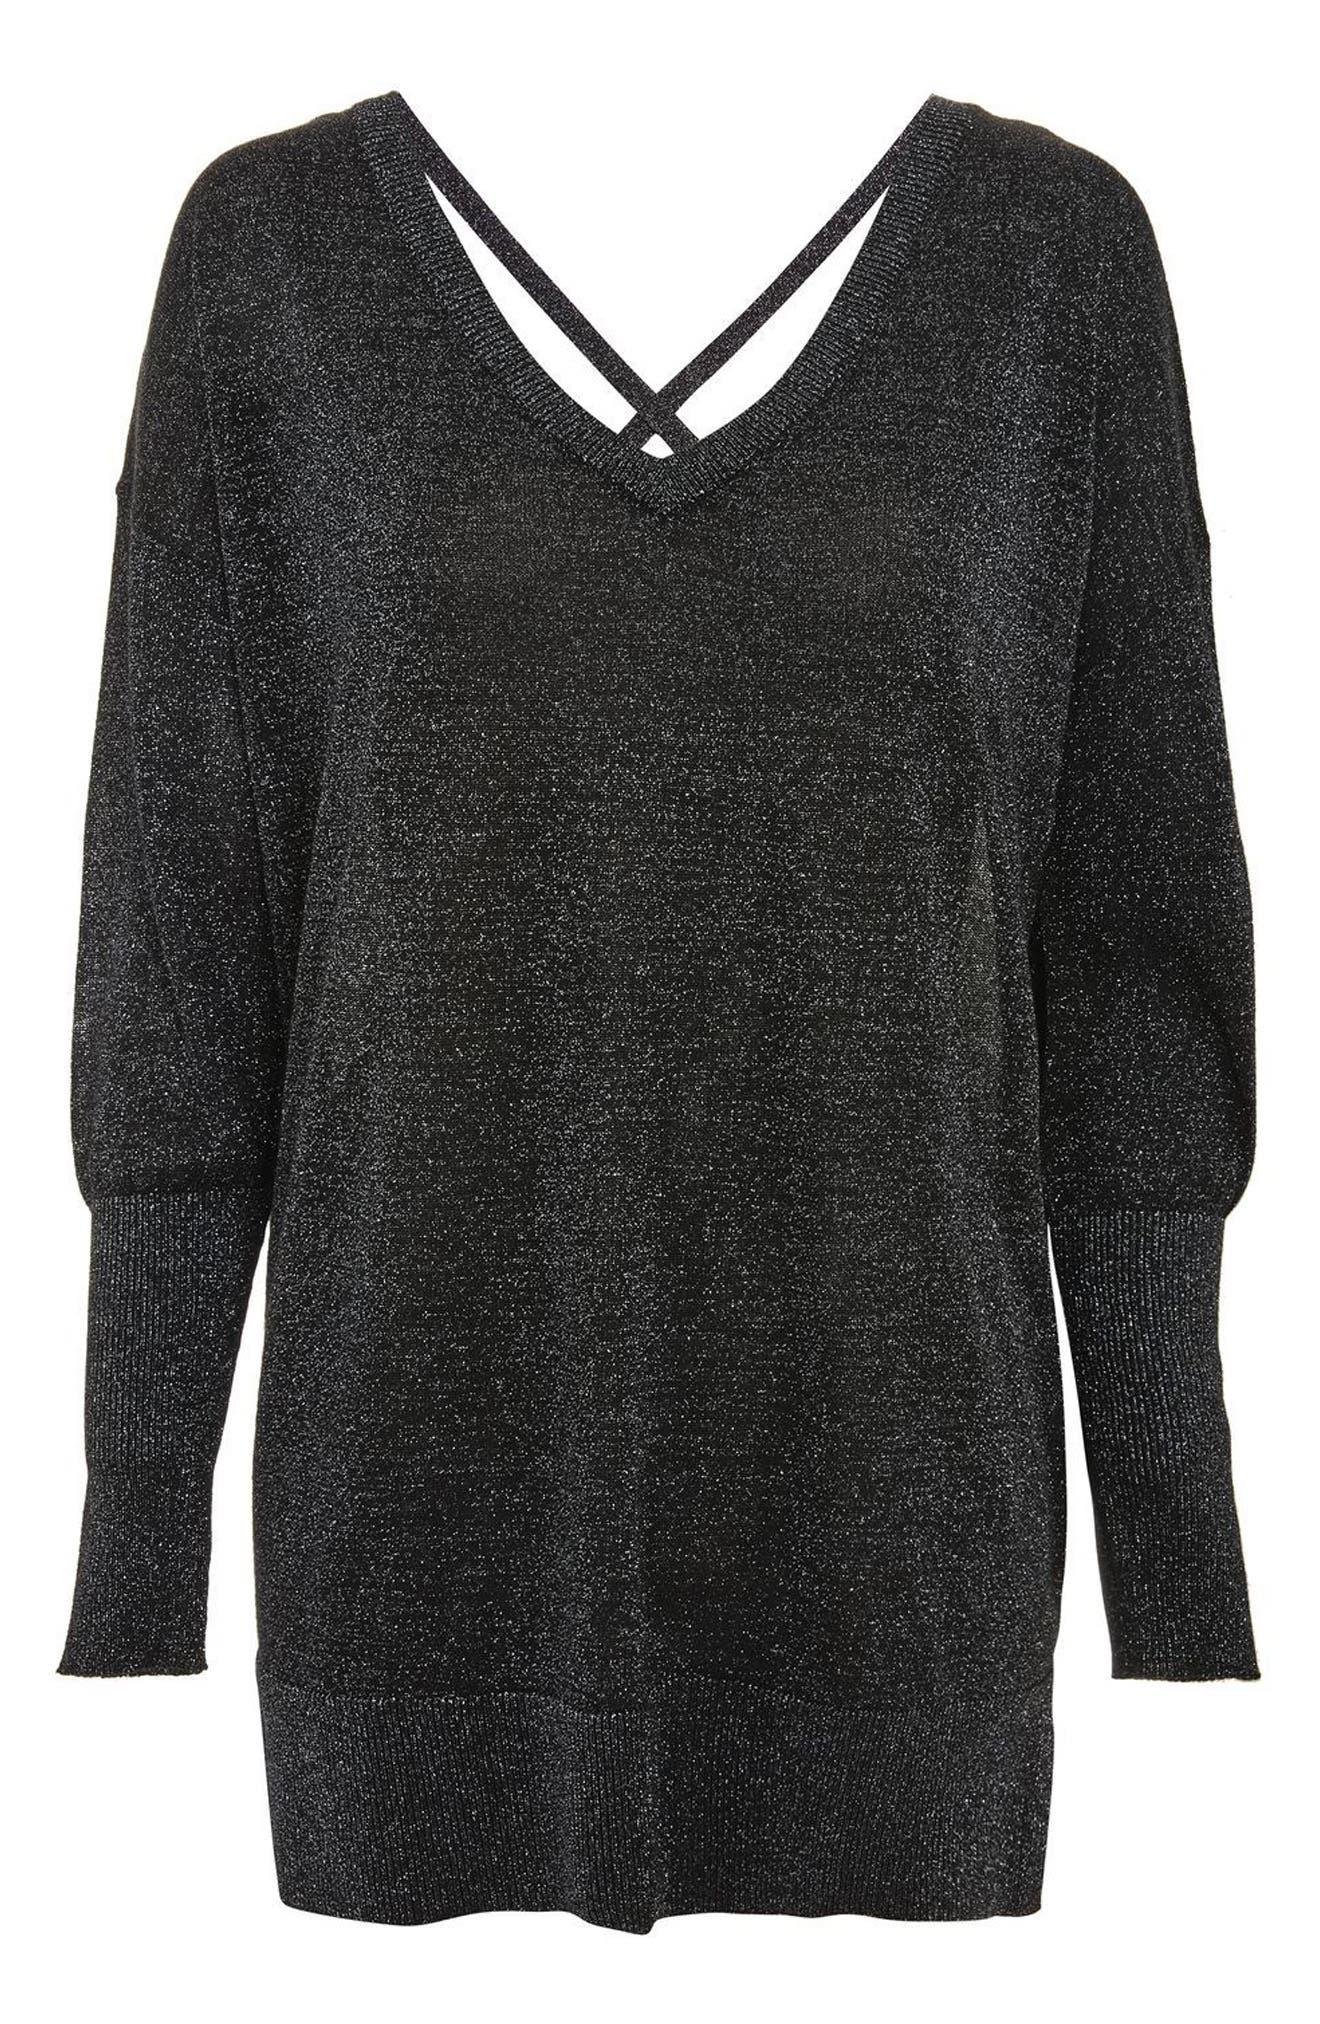 Cross Back Longline Metallic Sweater,                             Alternate thumbnail 4, color,                             Black